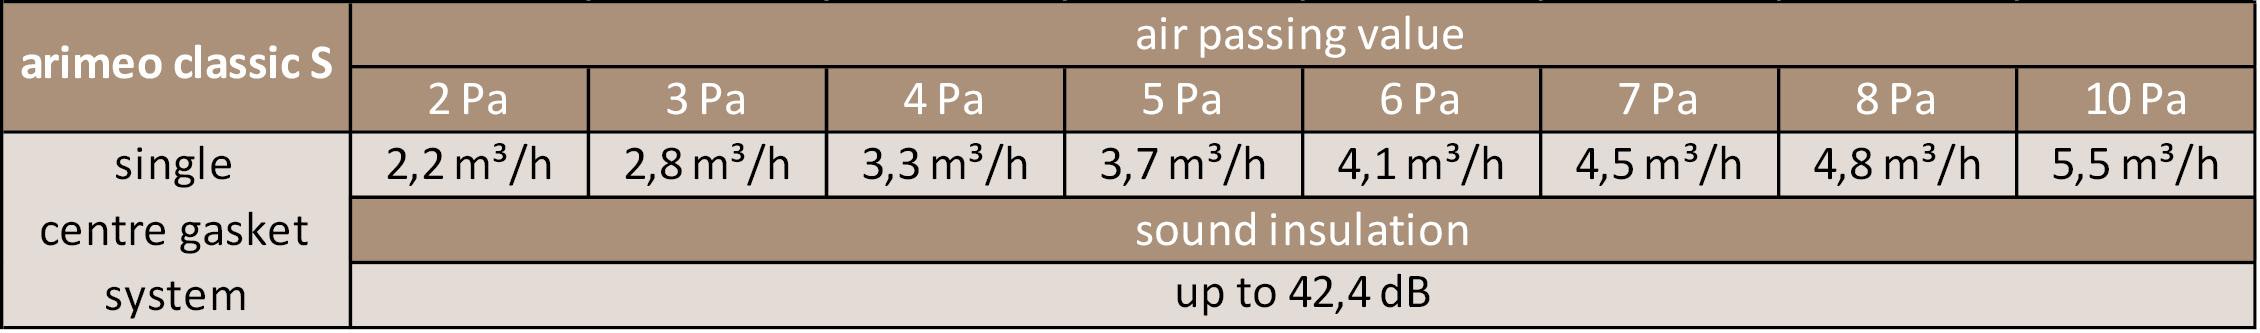 arimeo classic S performance data single MD